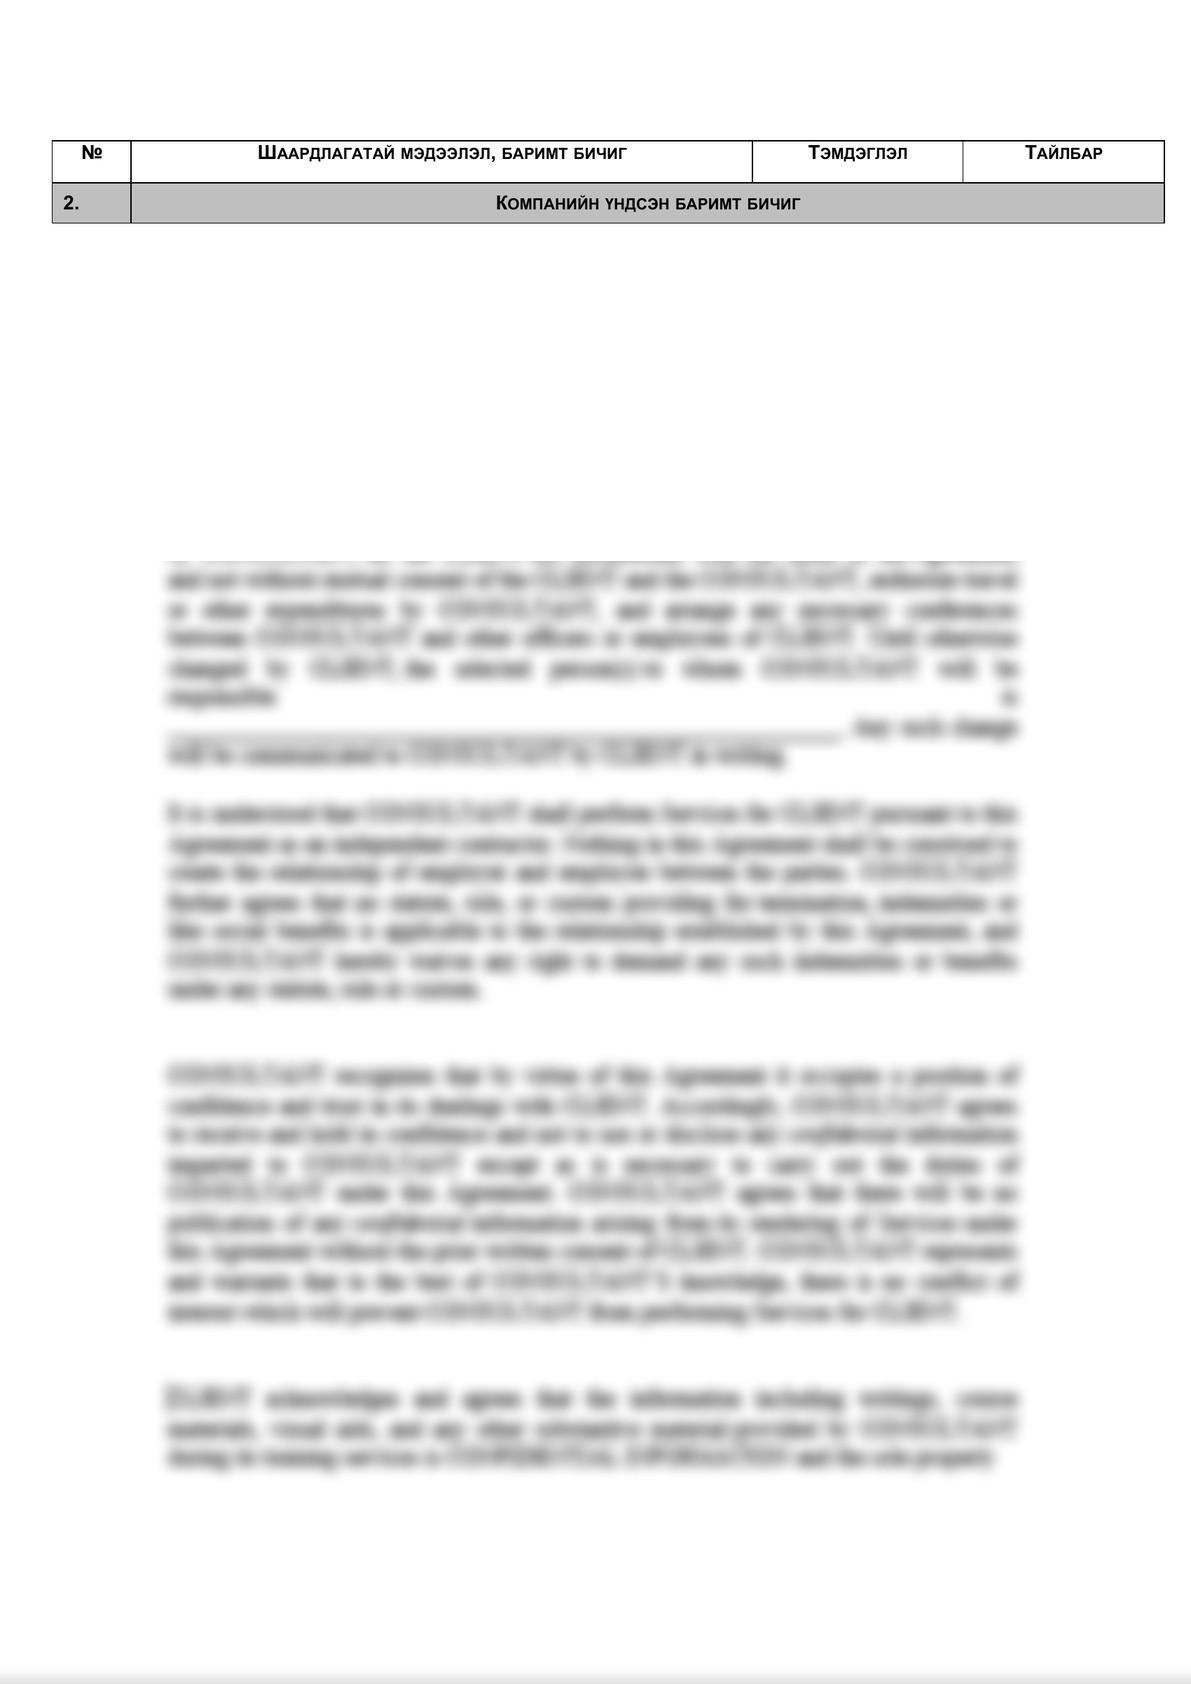 Legal due diligence checklist (Mongolian legal entities)    -5